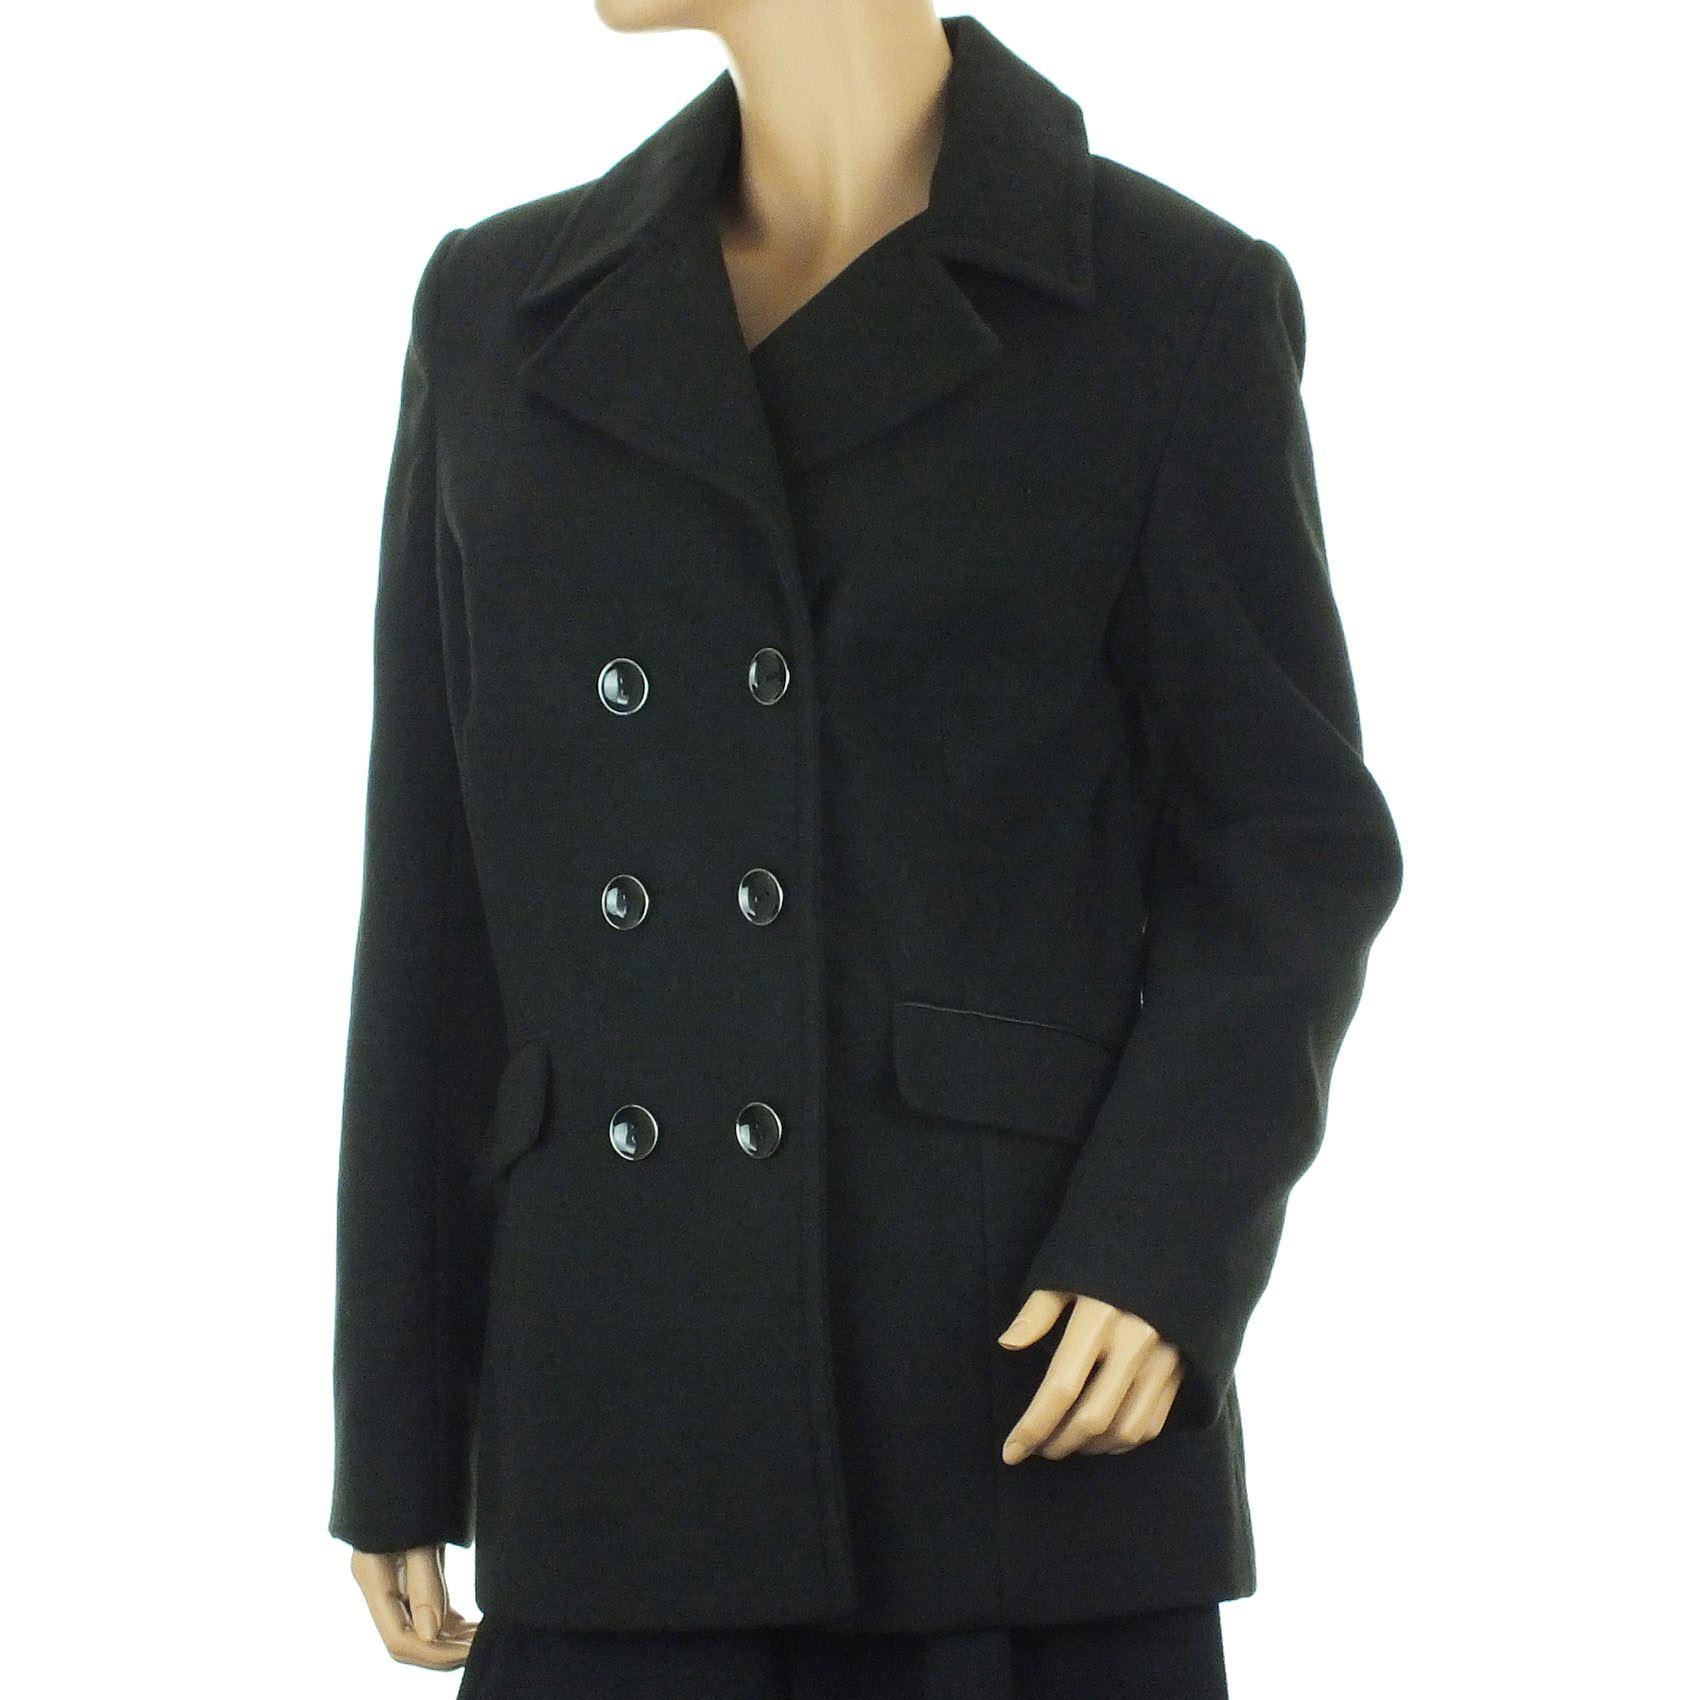 EX Debenhams Short Winter Coat Short Jacket Ladies Double Breasted Buttoned NEW | EBay